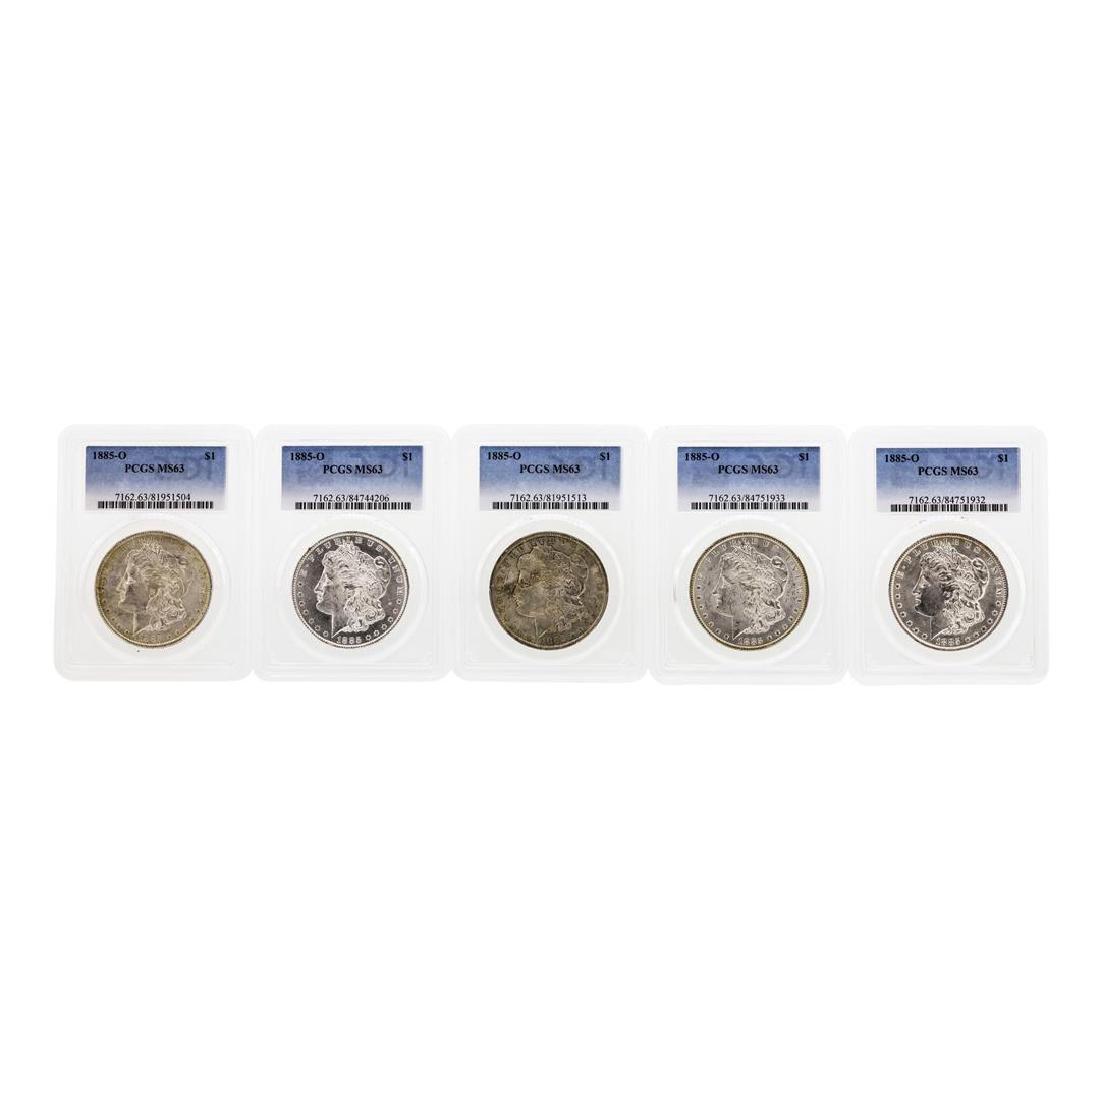 Lot of (5) 1885-O $1 Morgan Silver Dollar Coins PCGS